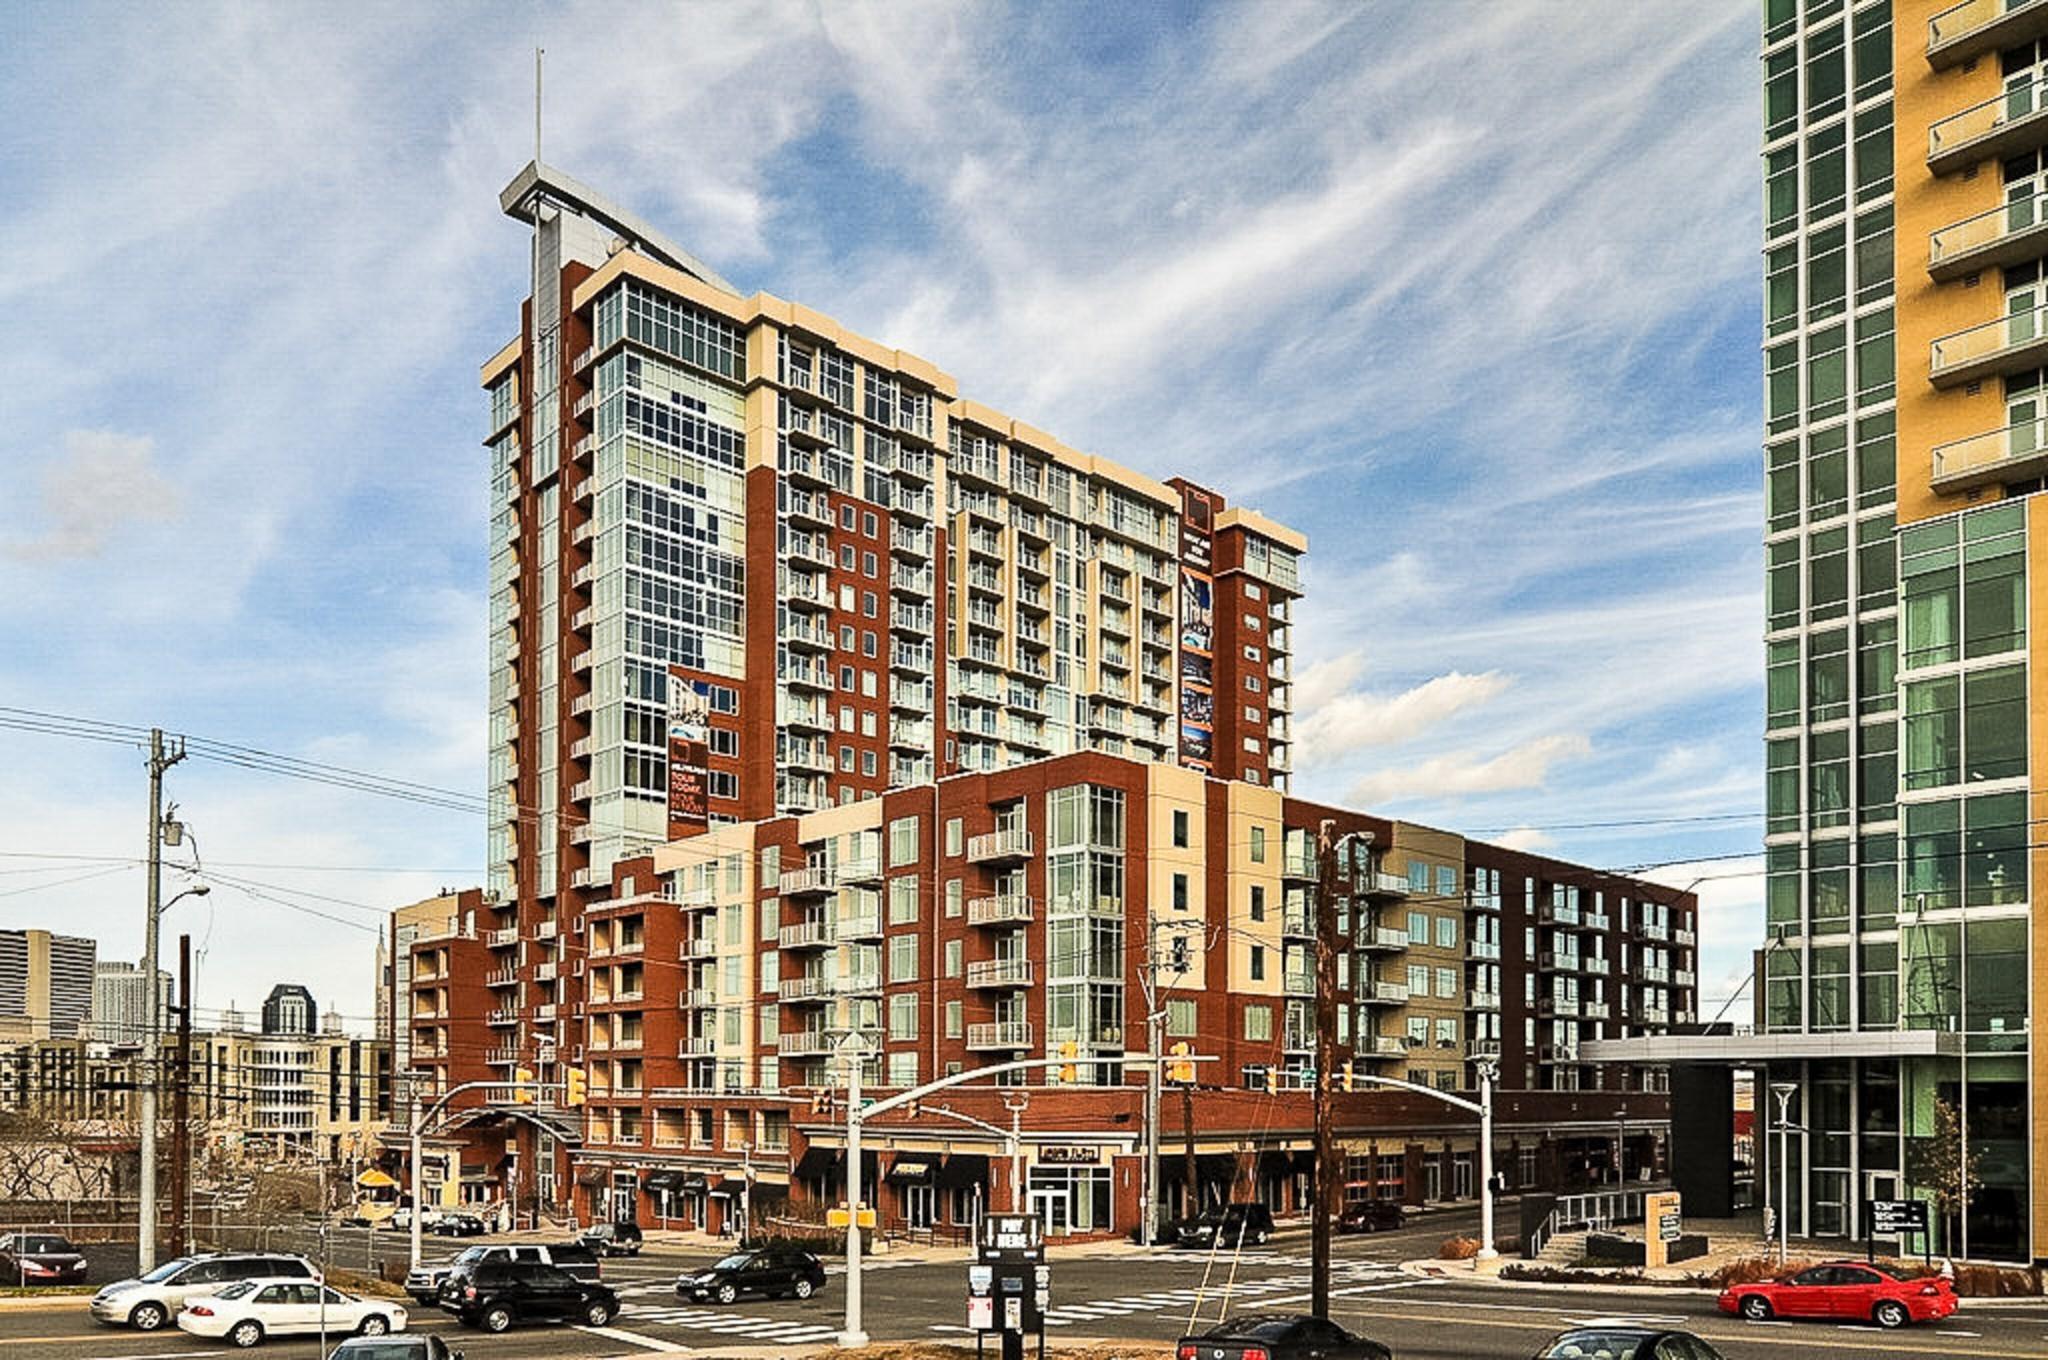 600 12th Ave S #415 Property Photo - Nashville, TN real estate listing